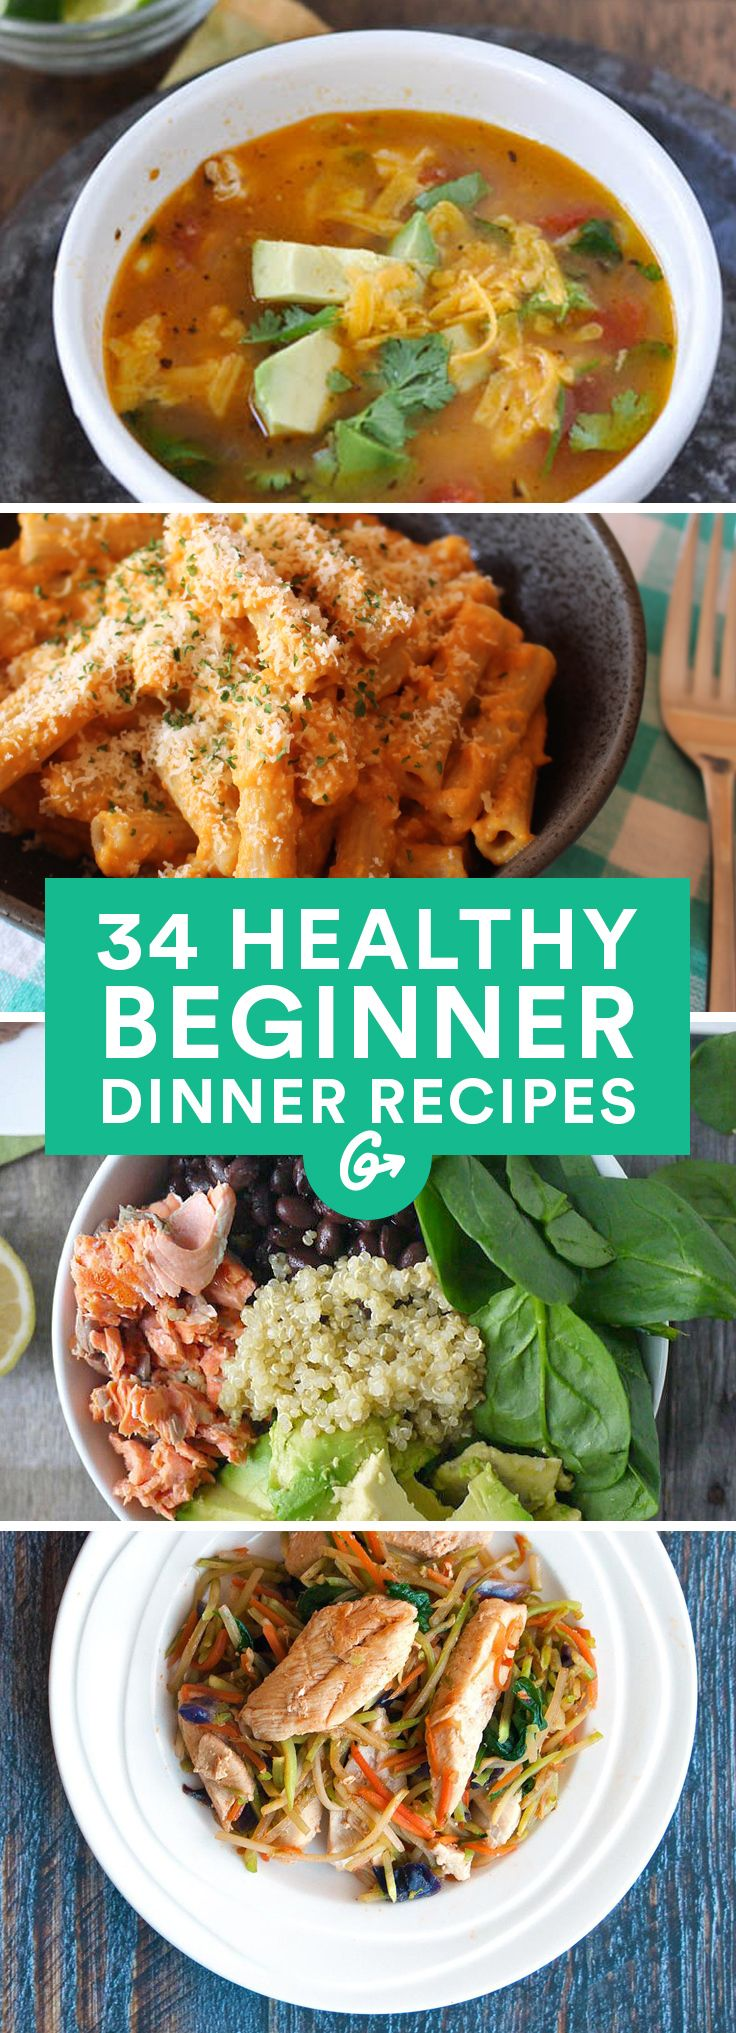 27 Easy Healthy Dinner Recipes